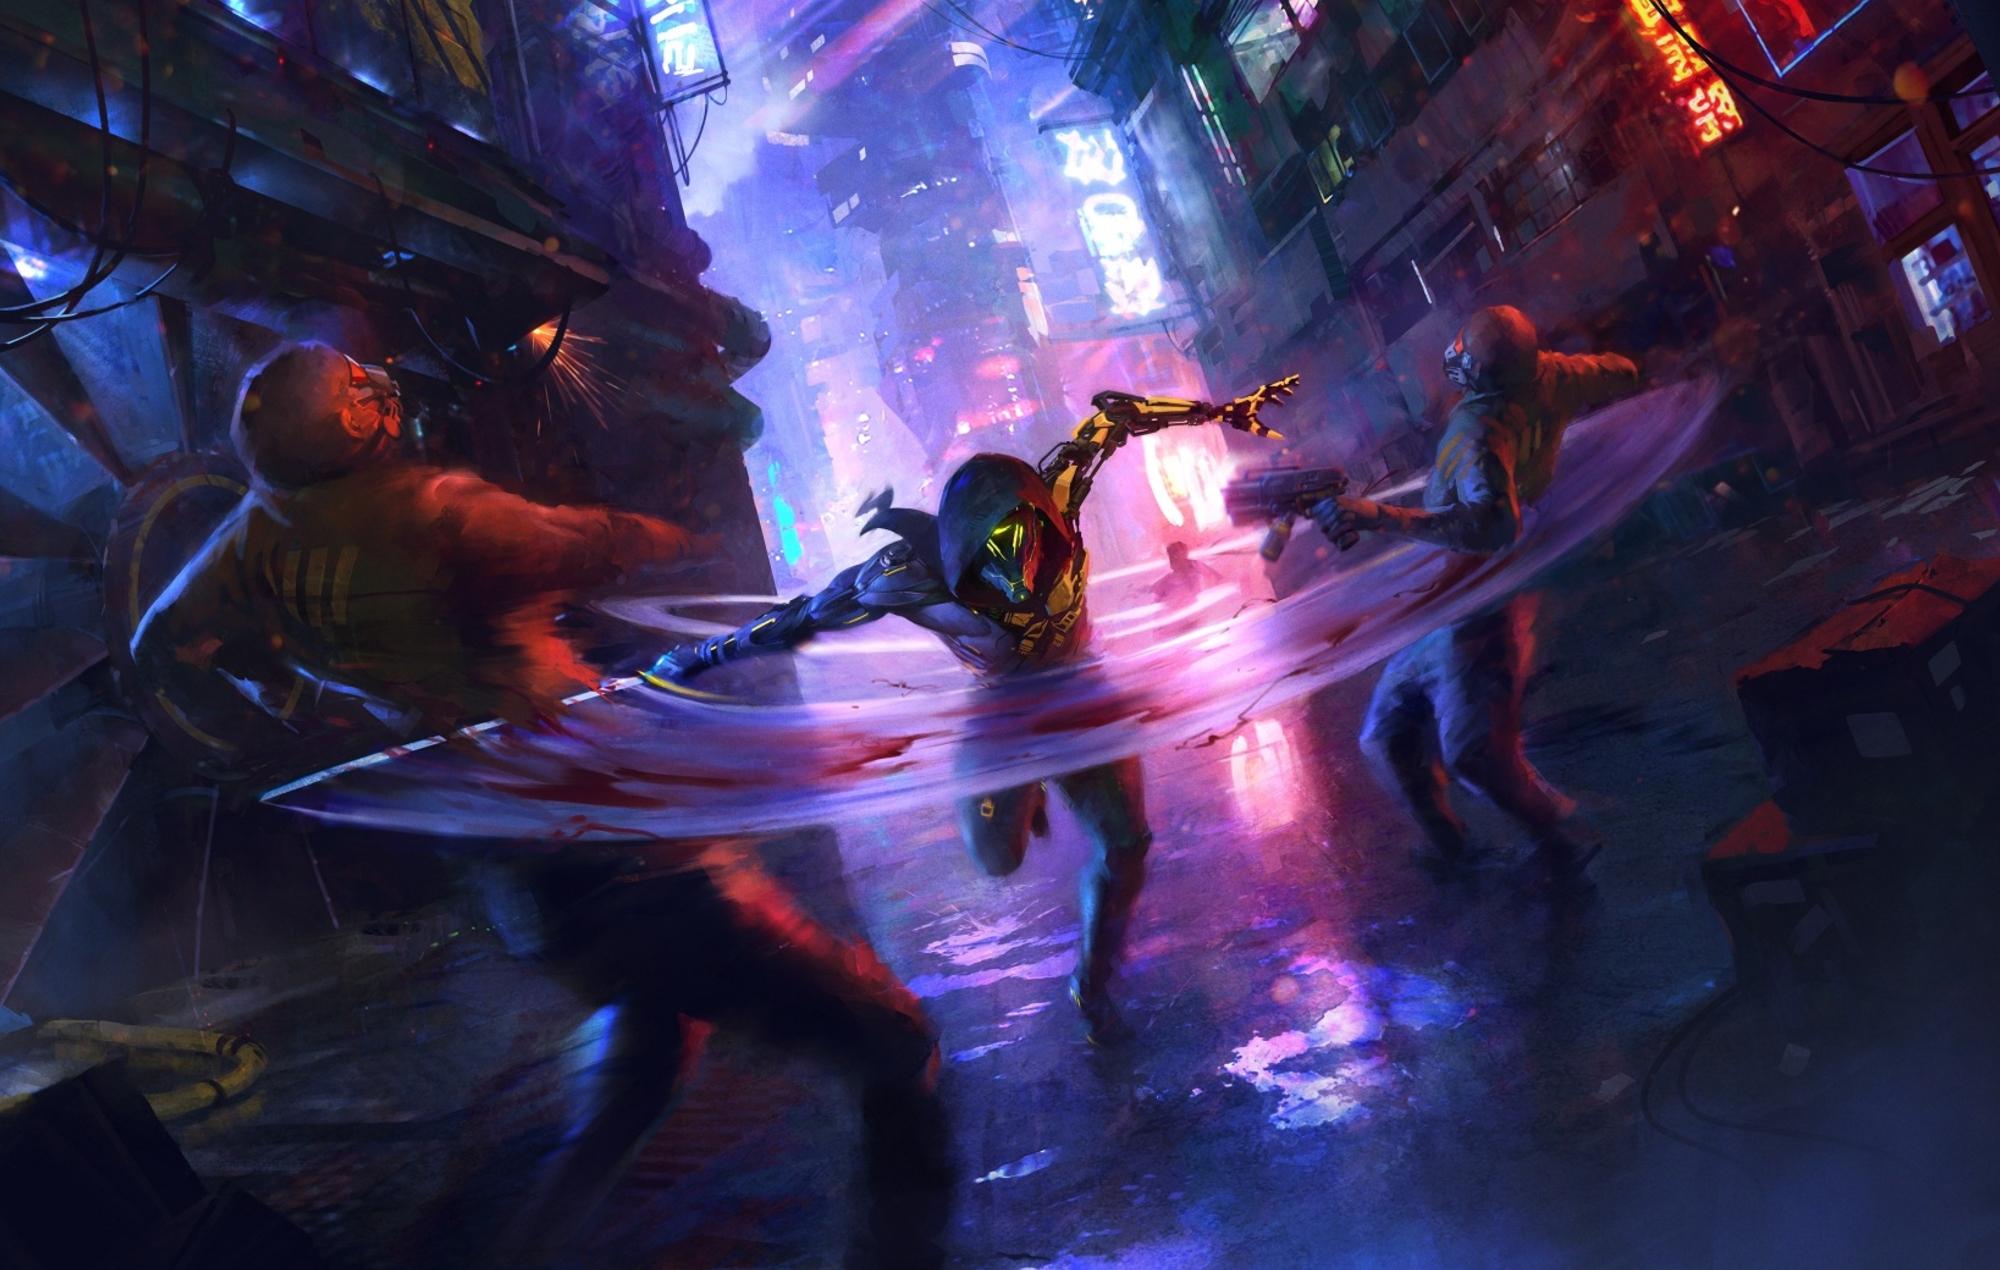 Nintendo Switch release confirmed for 'Ghostrunner'